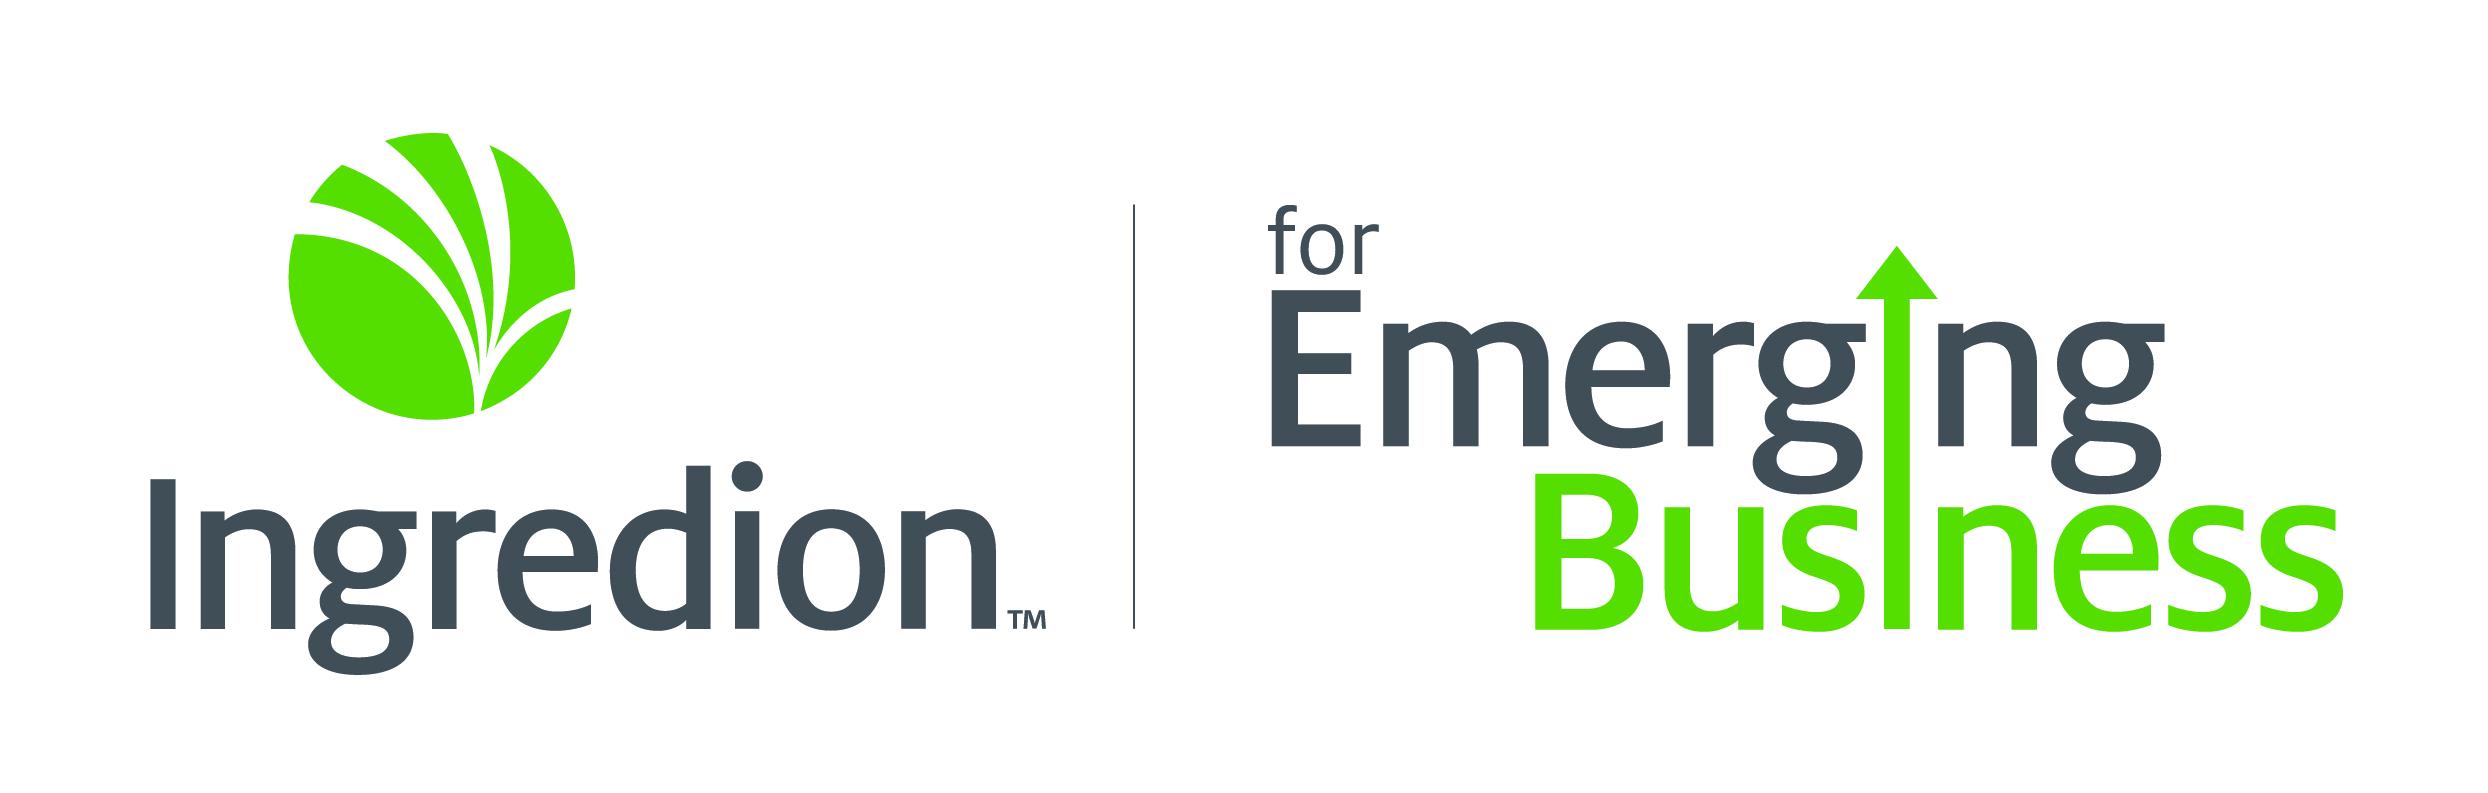 INGR_for_Emerging_Business_2c